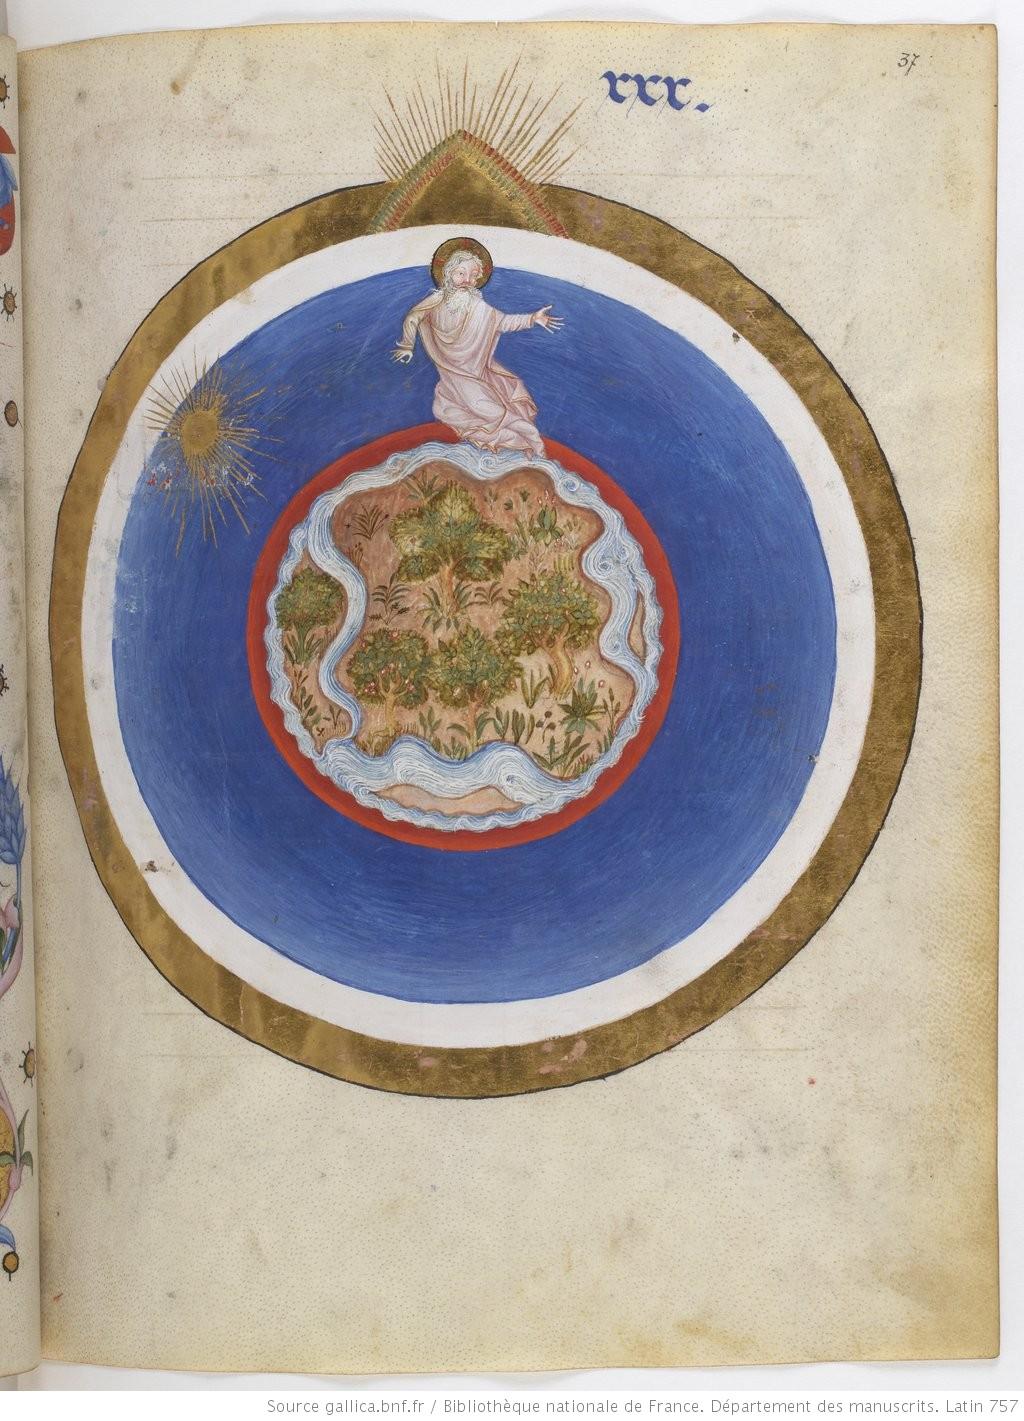 3 Mardi Missel a l'usage des freres mineurs, Lombardie, 1388, Gallica BNF ms. lat. 757, fol. 37r